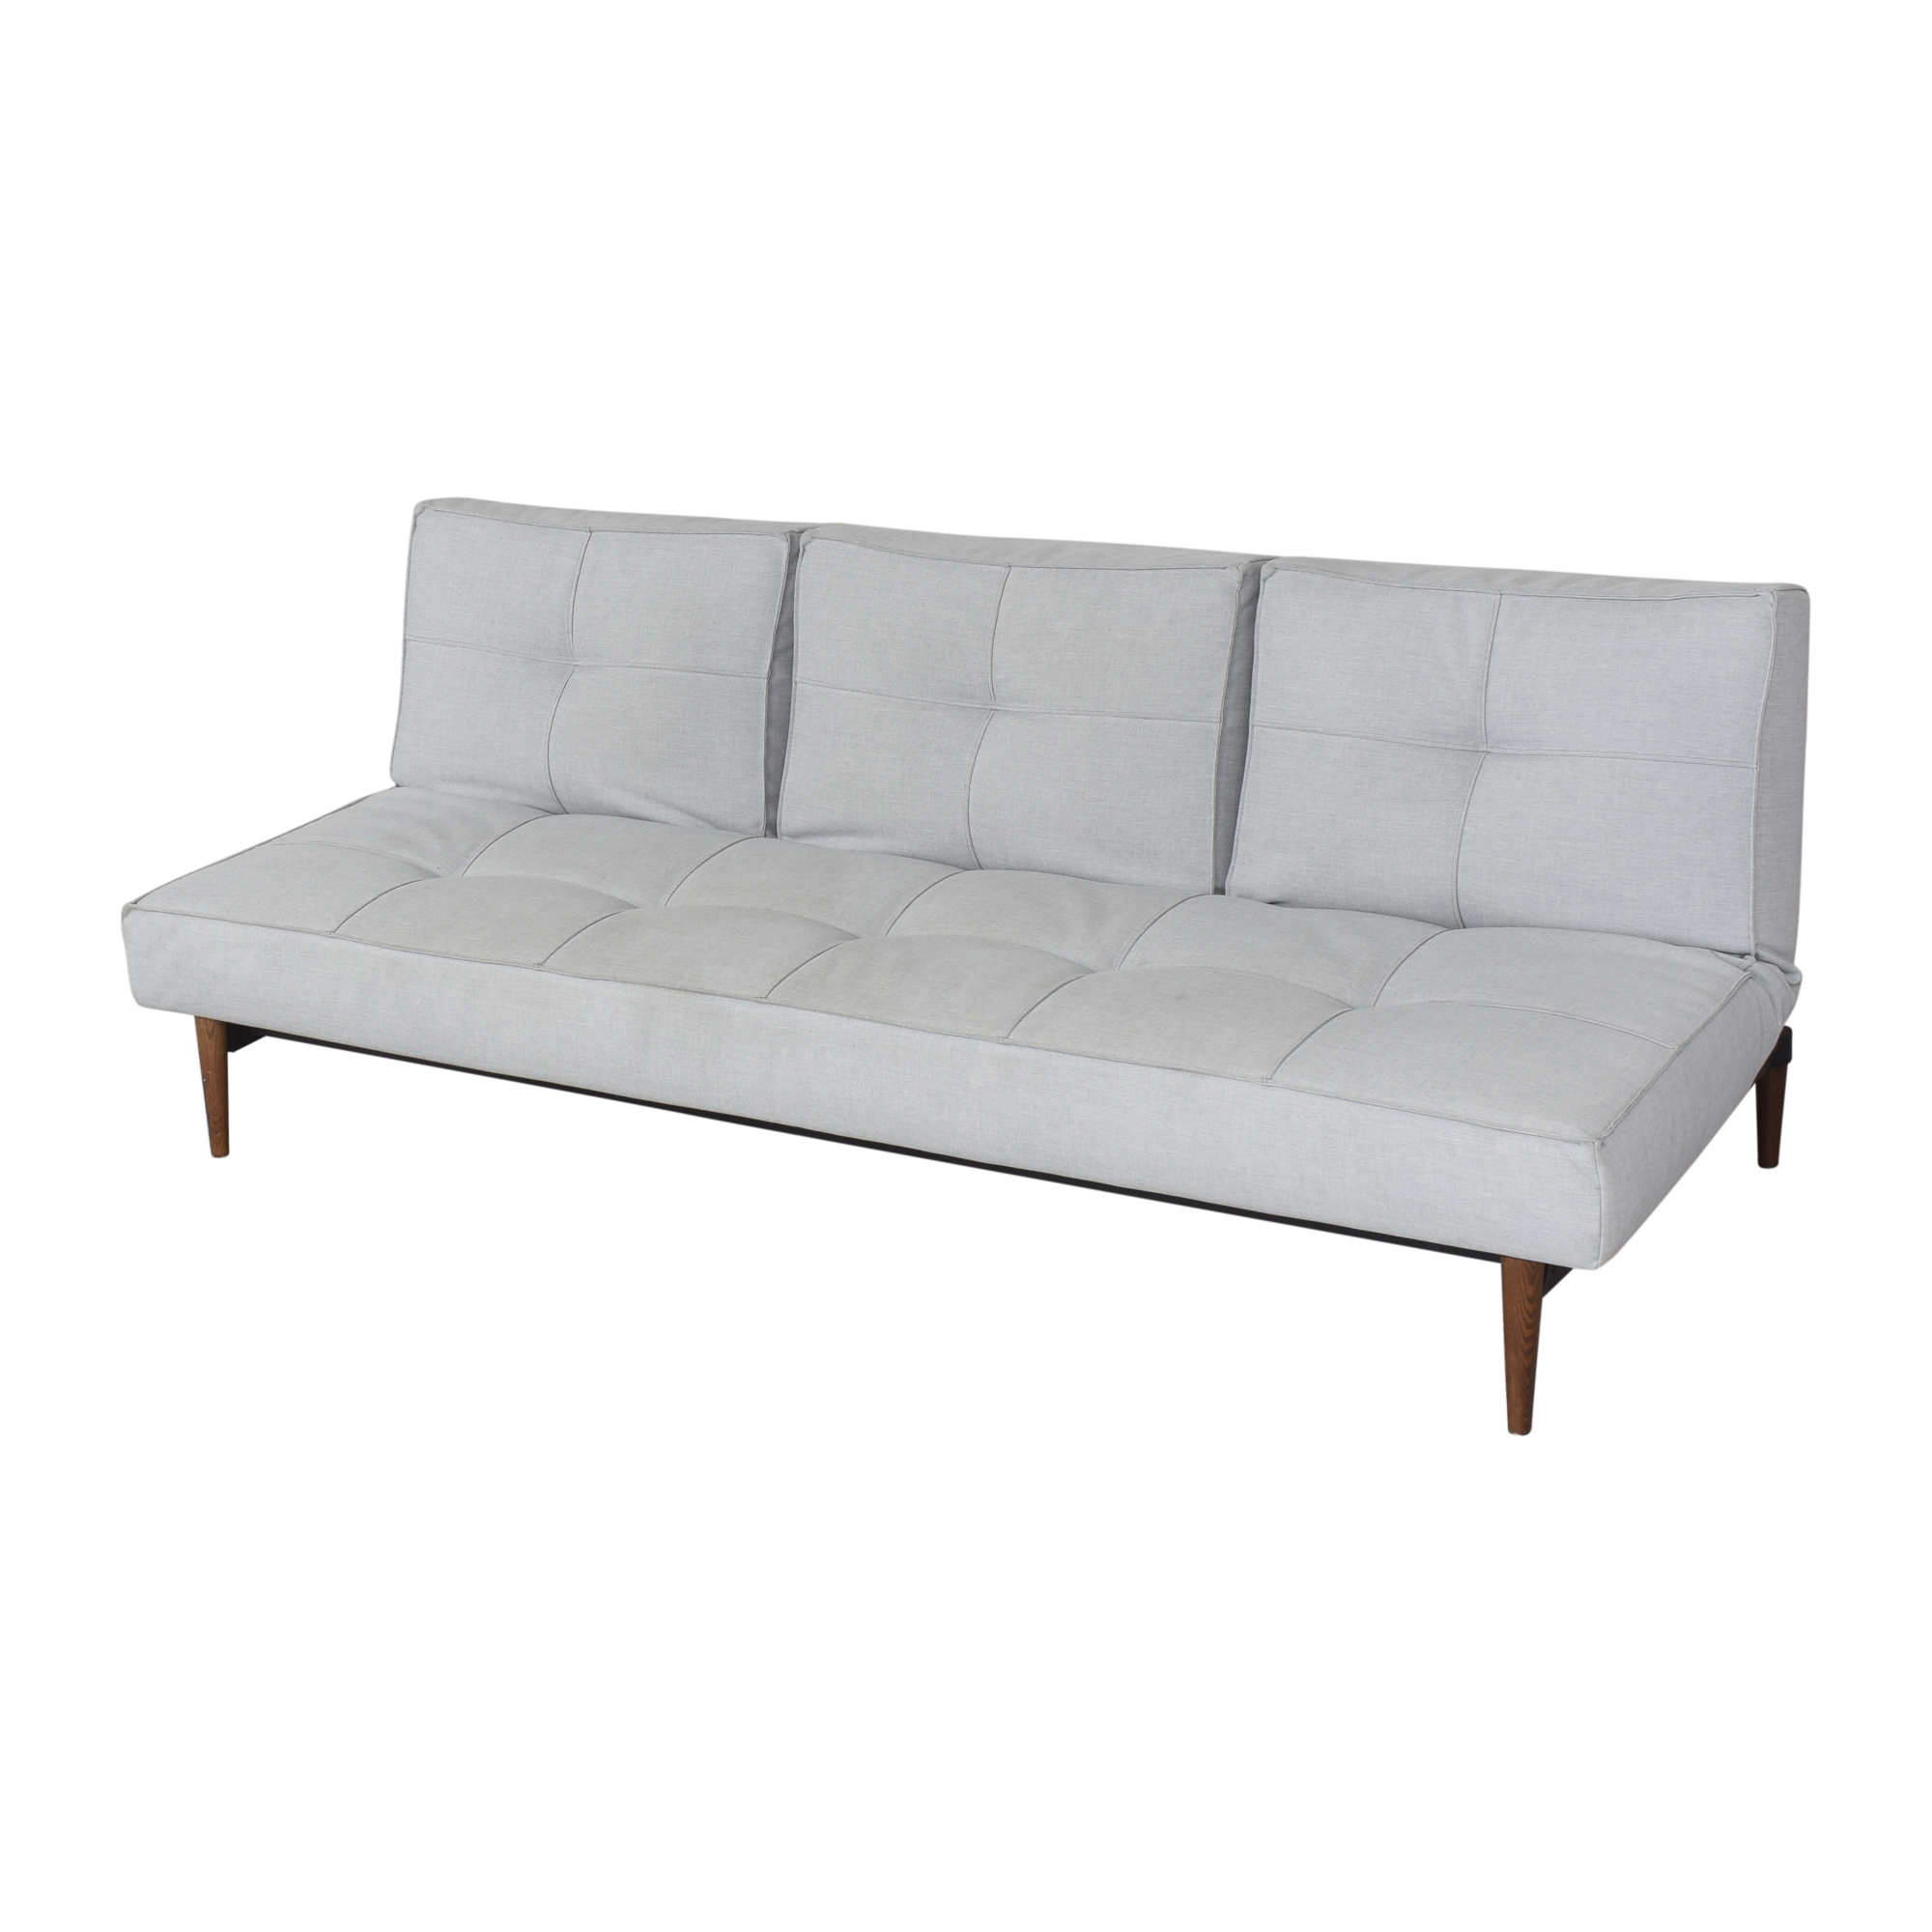 buy Innovation Living Innovation Living Convertible Sofa Bed online